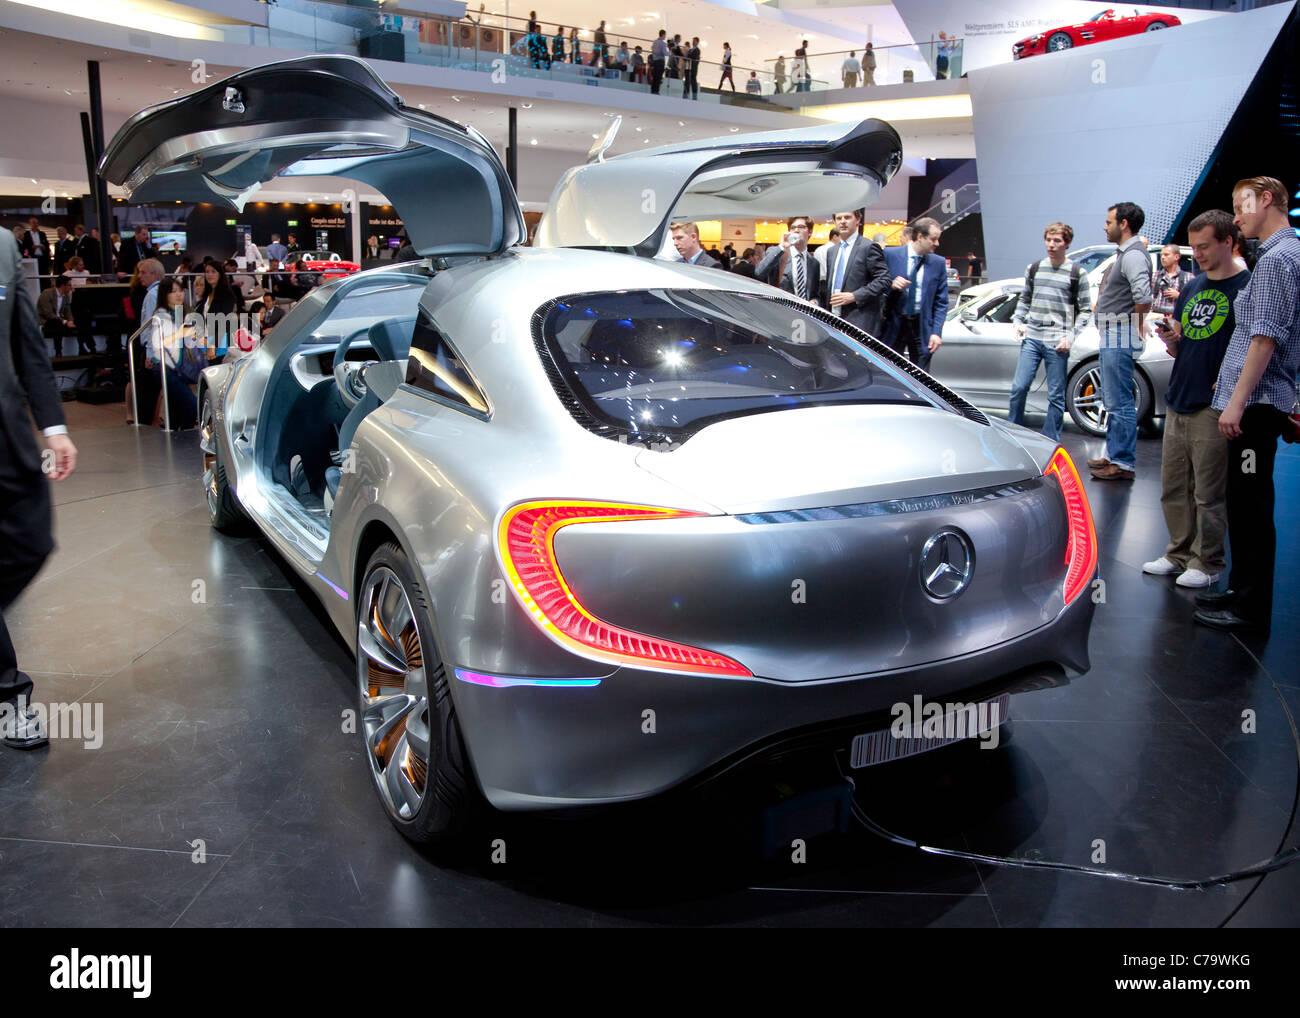 New Mercedes Benz Concept Car F125 on the IAA 2011 International Motor Show Frankfurt, Germany Stock Photo